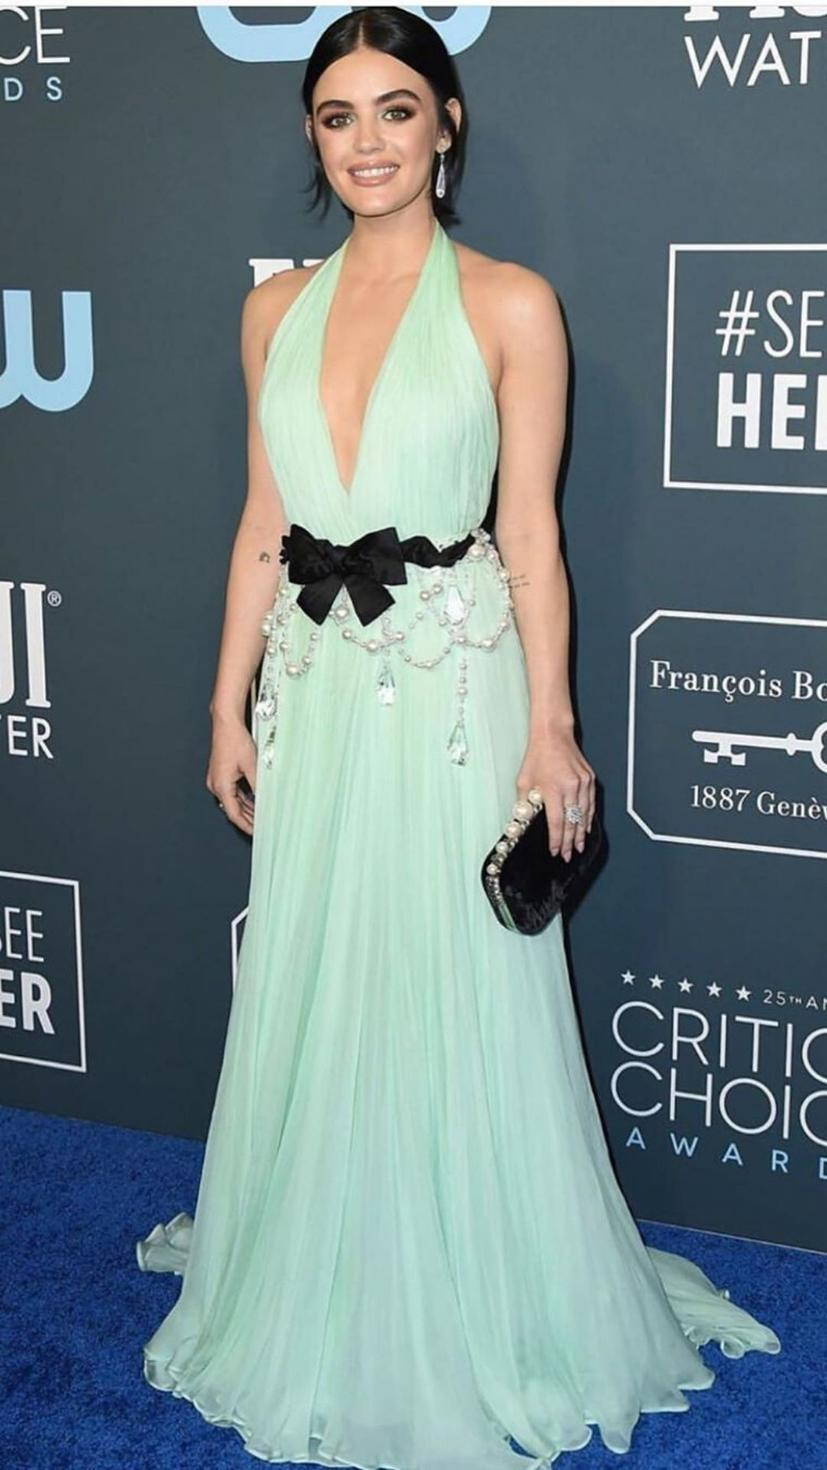 Lucy Hale wears a mint Miu Miu gown, Djula jewellery and Jimmy Choo shoes.